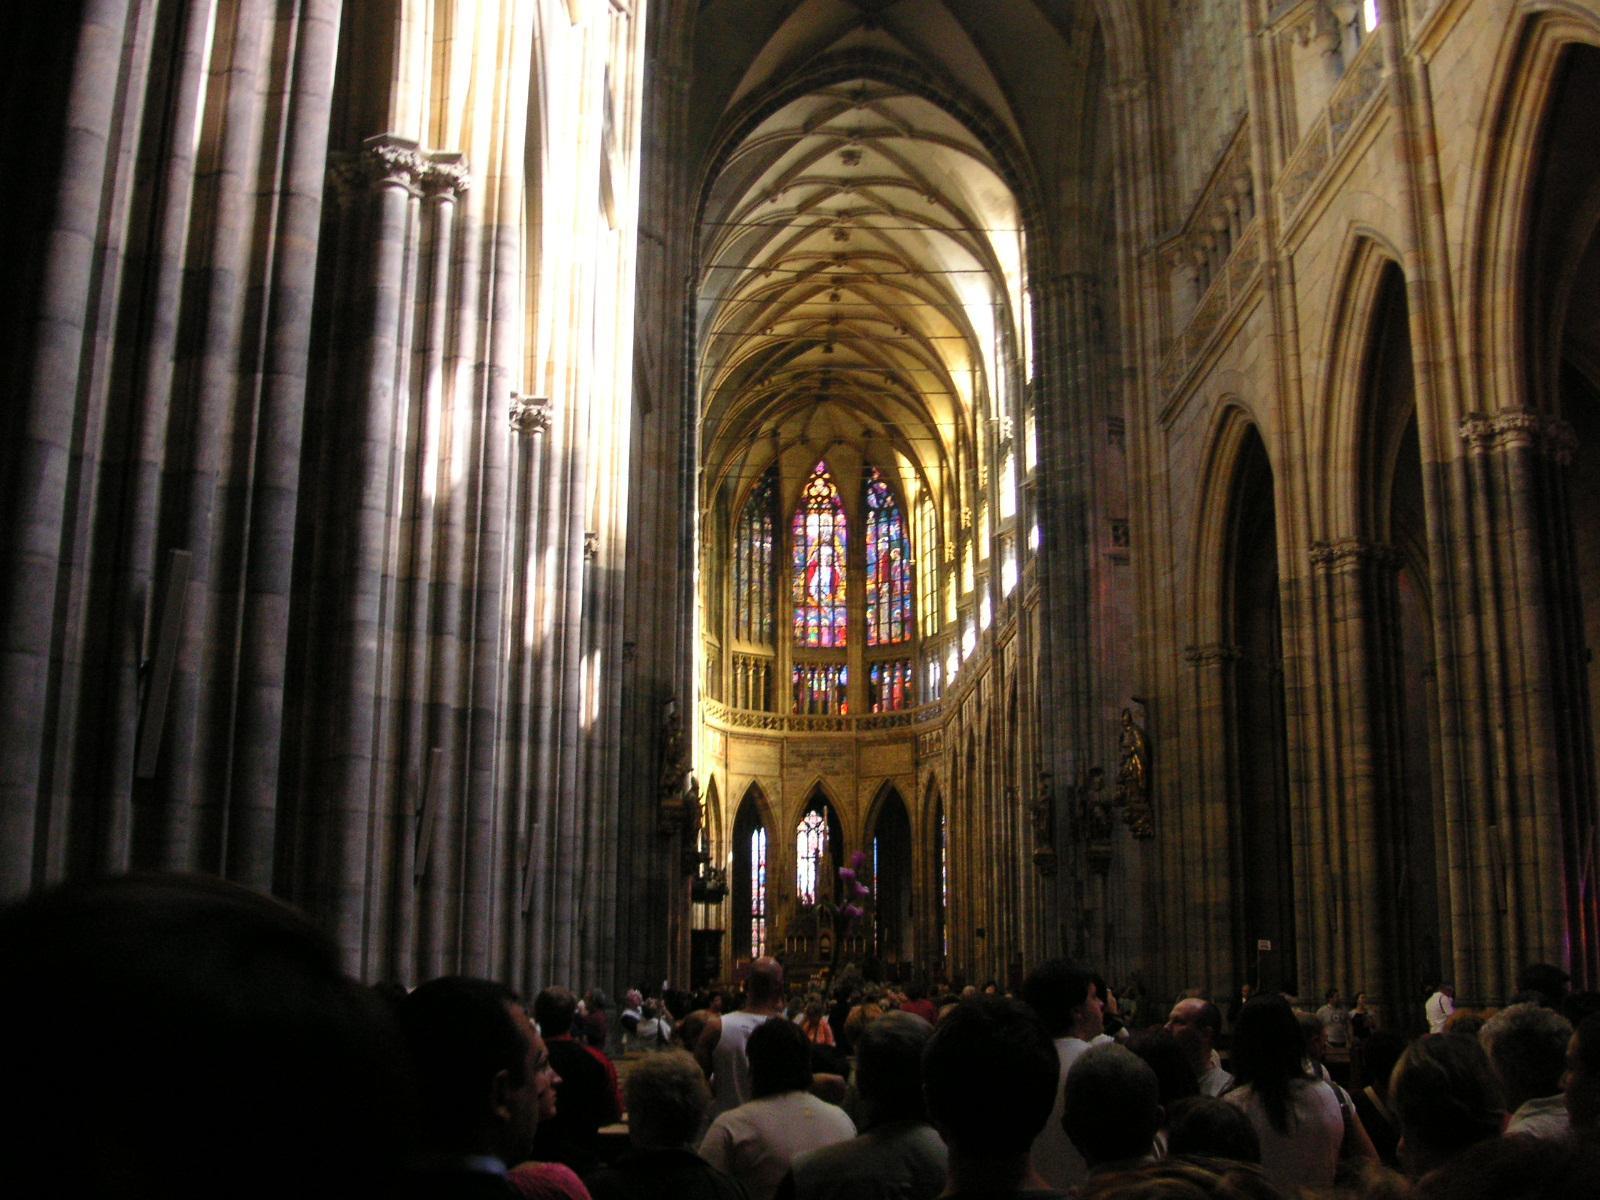 Interior de la catedral de San Vito